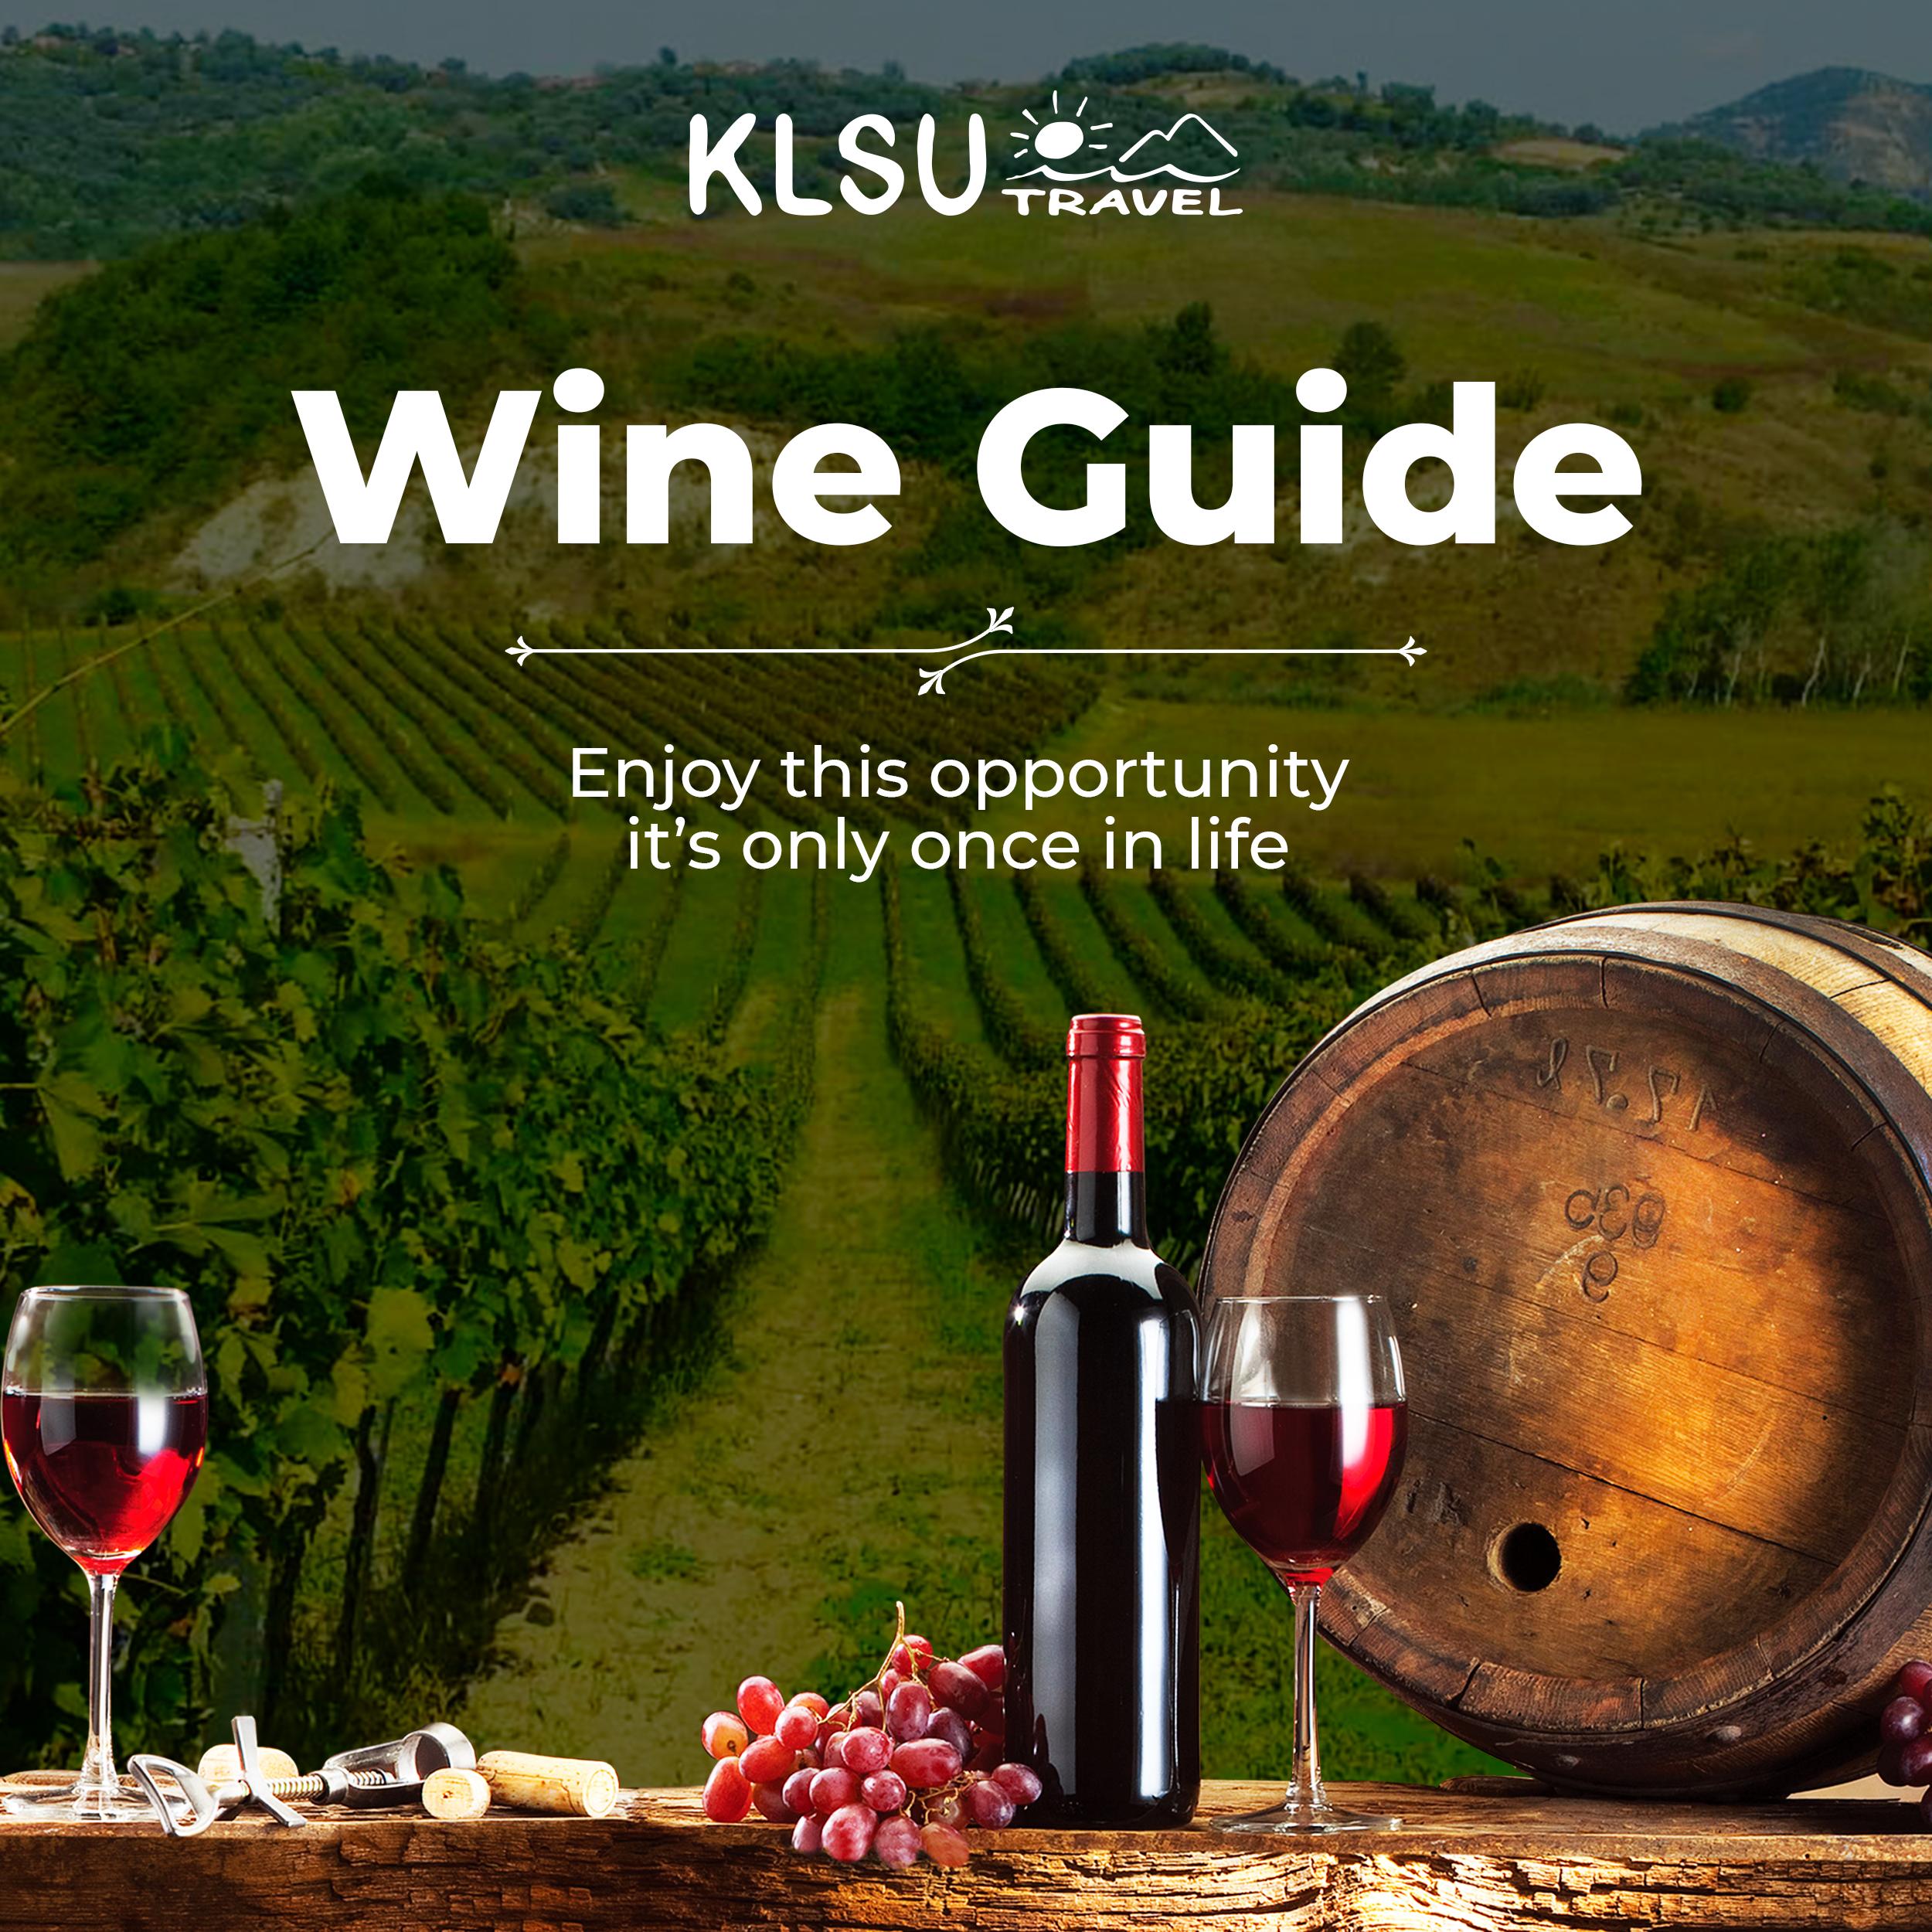 Skënderbeu Winery